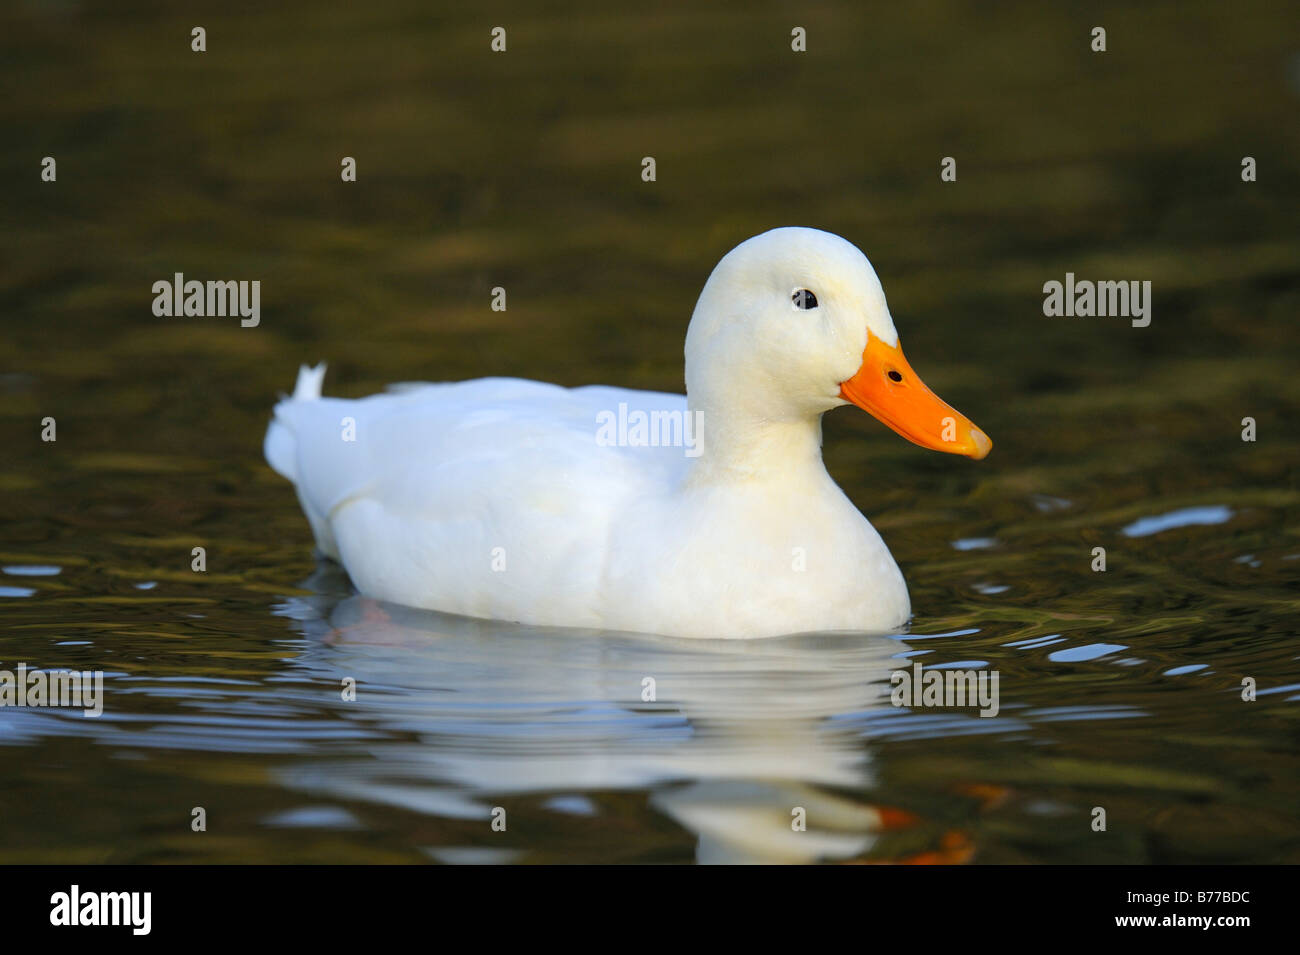 Domestic duck - Stock Image